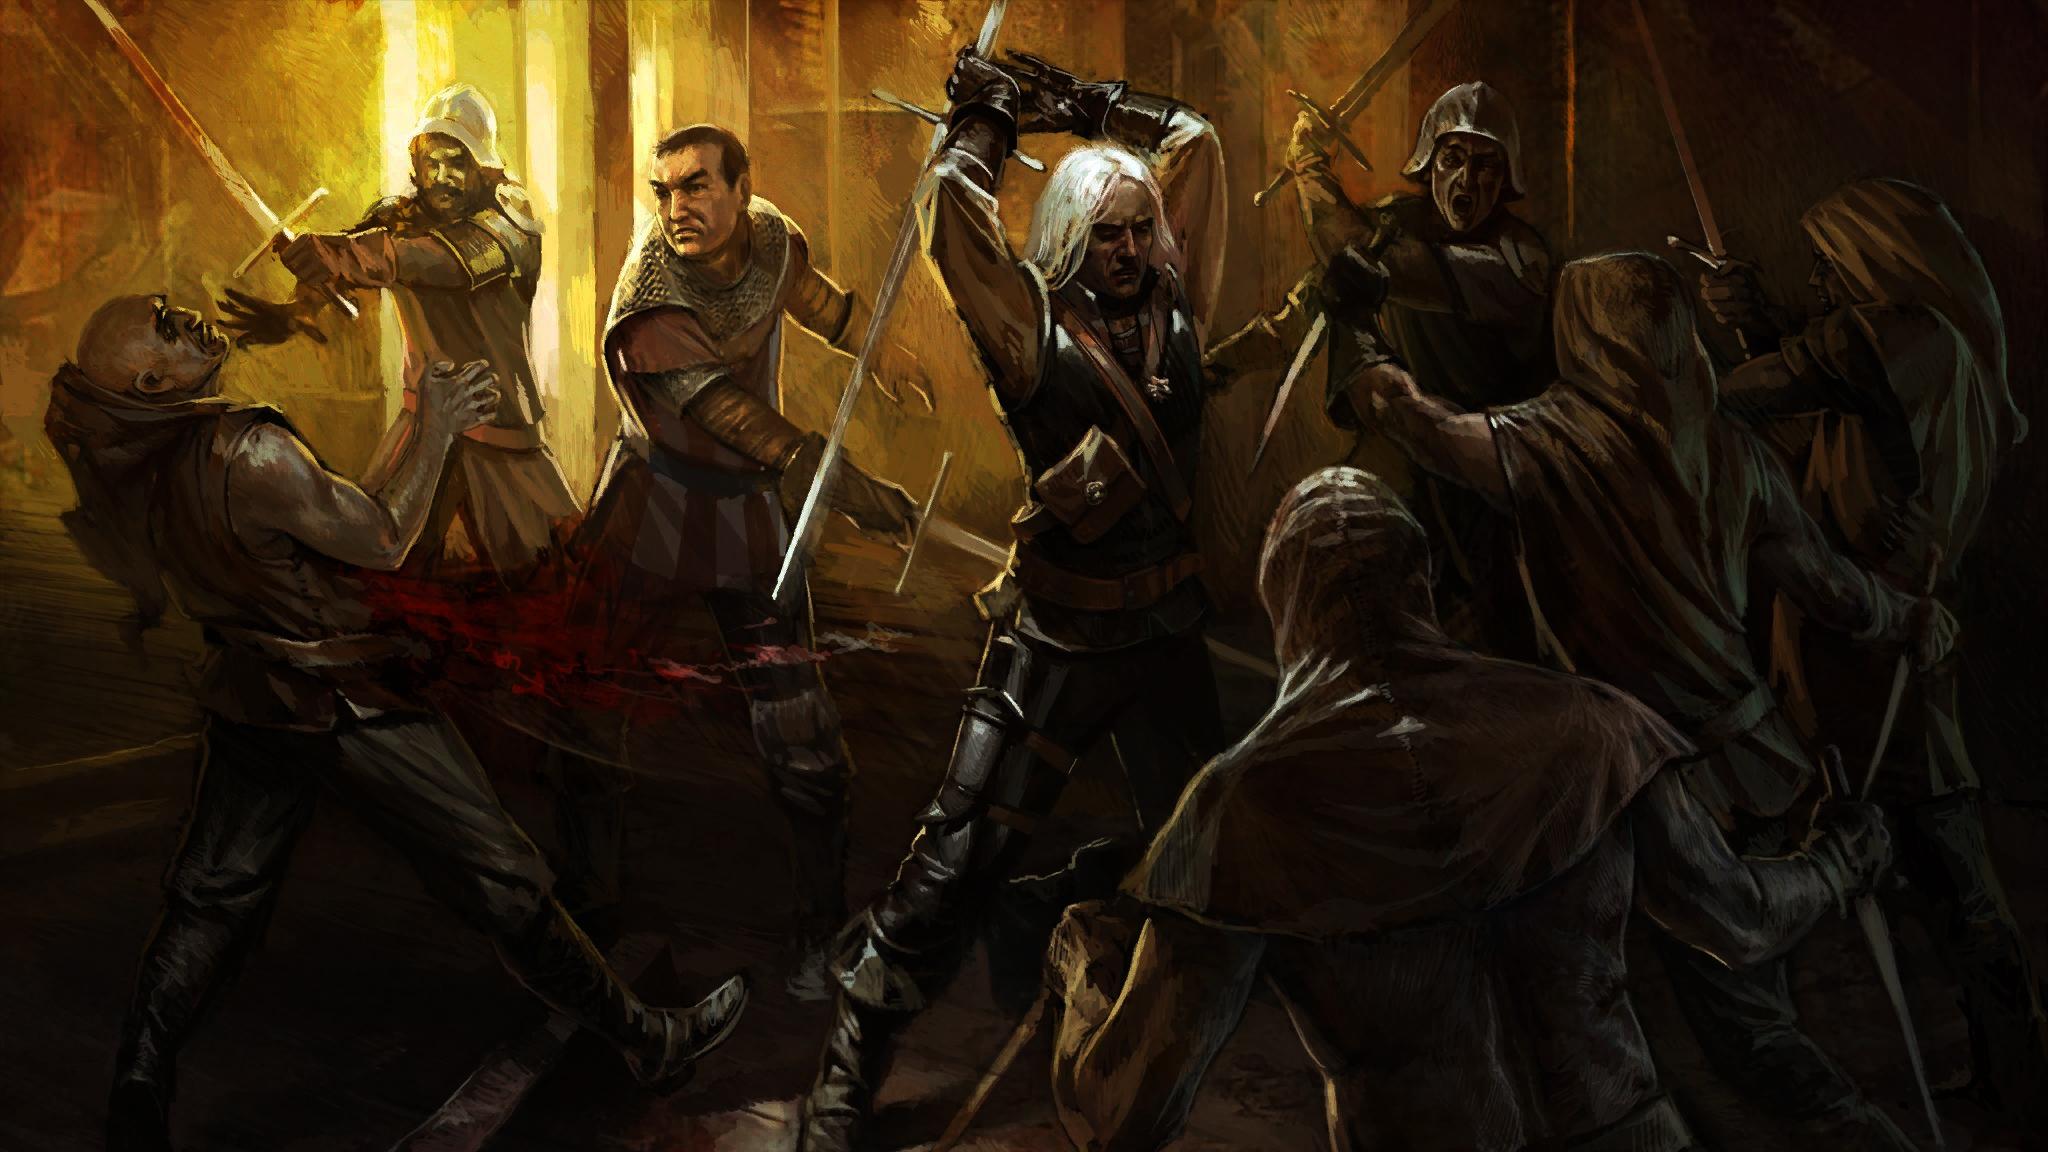 Geralt fights bandits